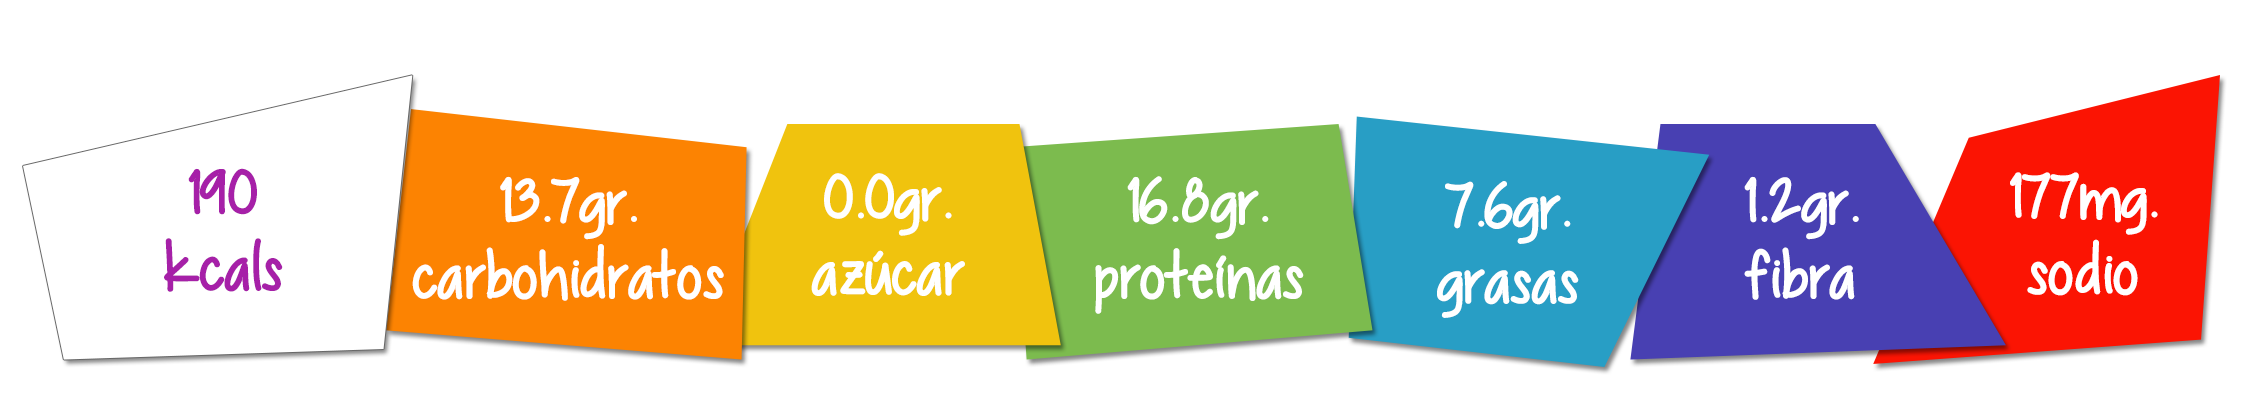 tabla_nutricional_salpicon